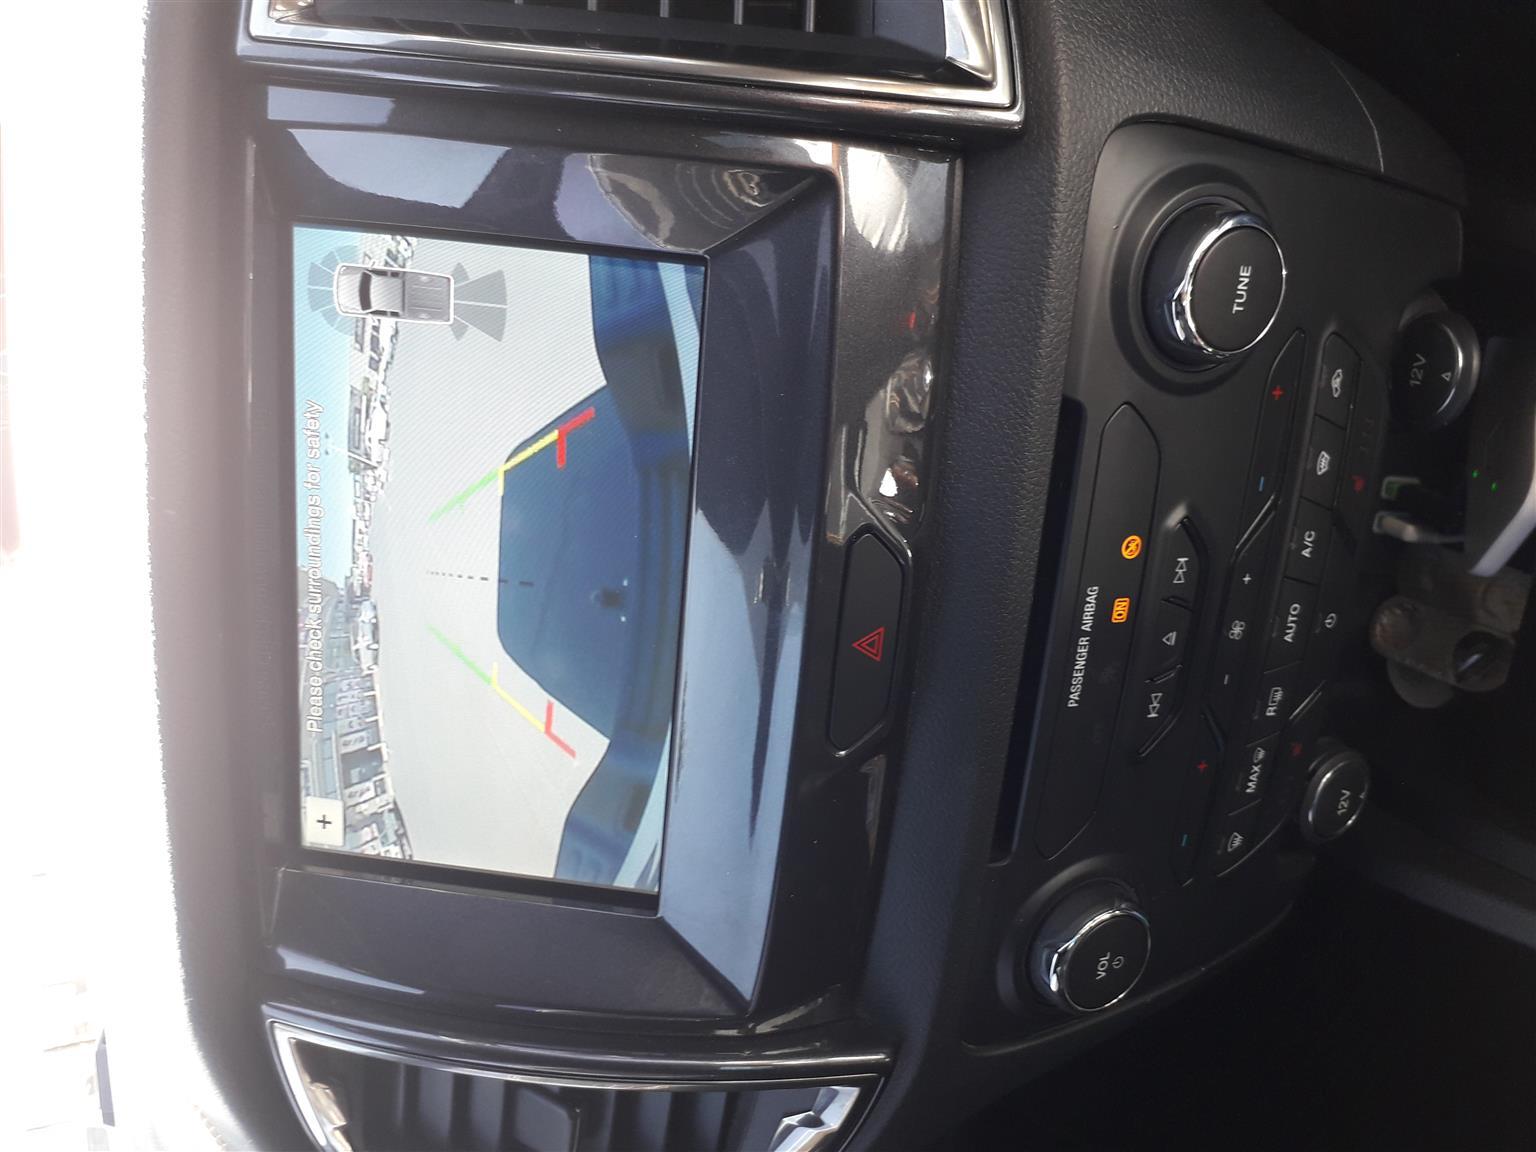 2019 Ford Ranger 3.2 double cab Hi Rider Wildtrak auto